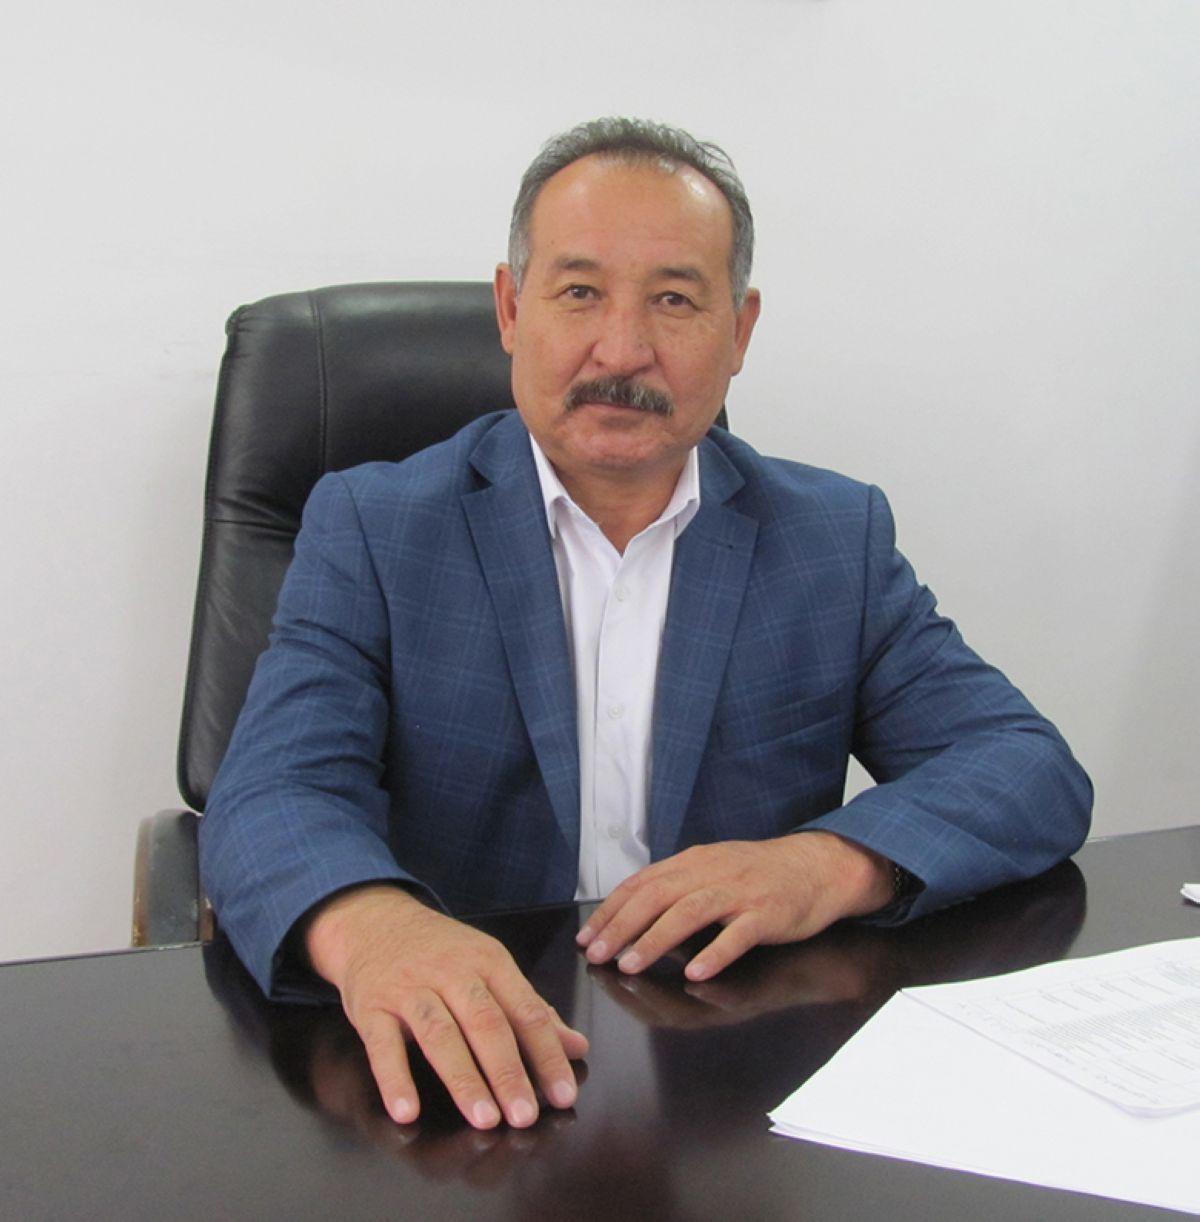 Besimbaev